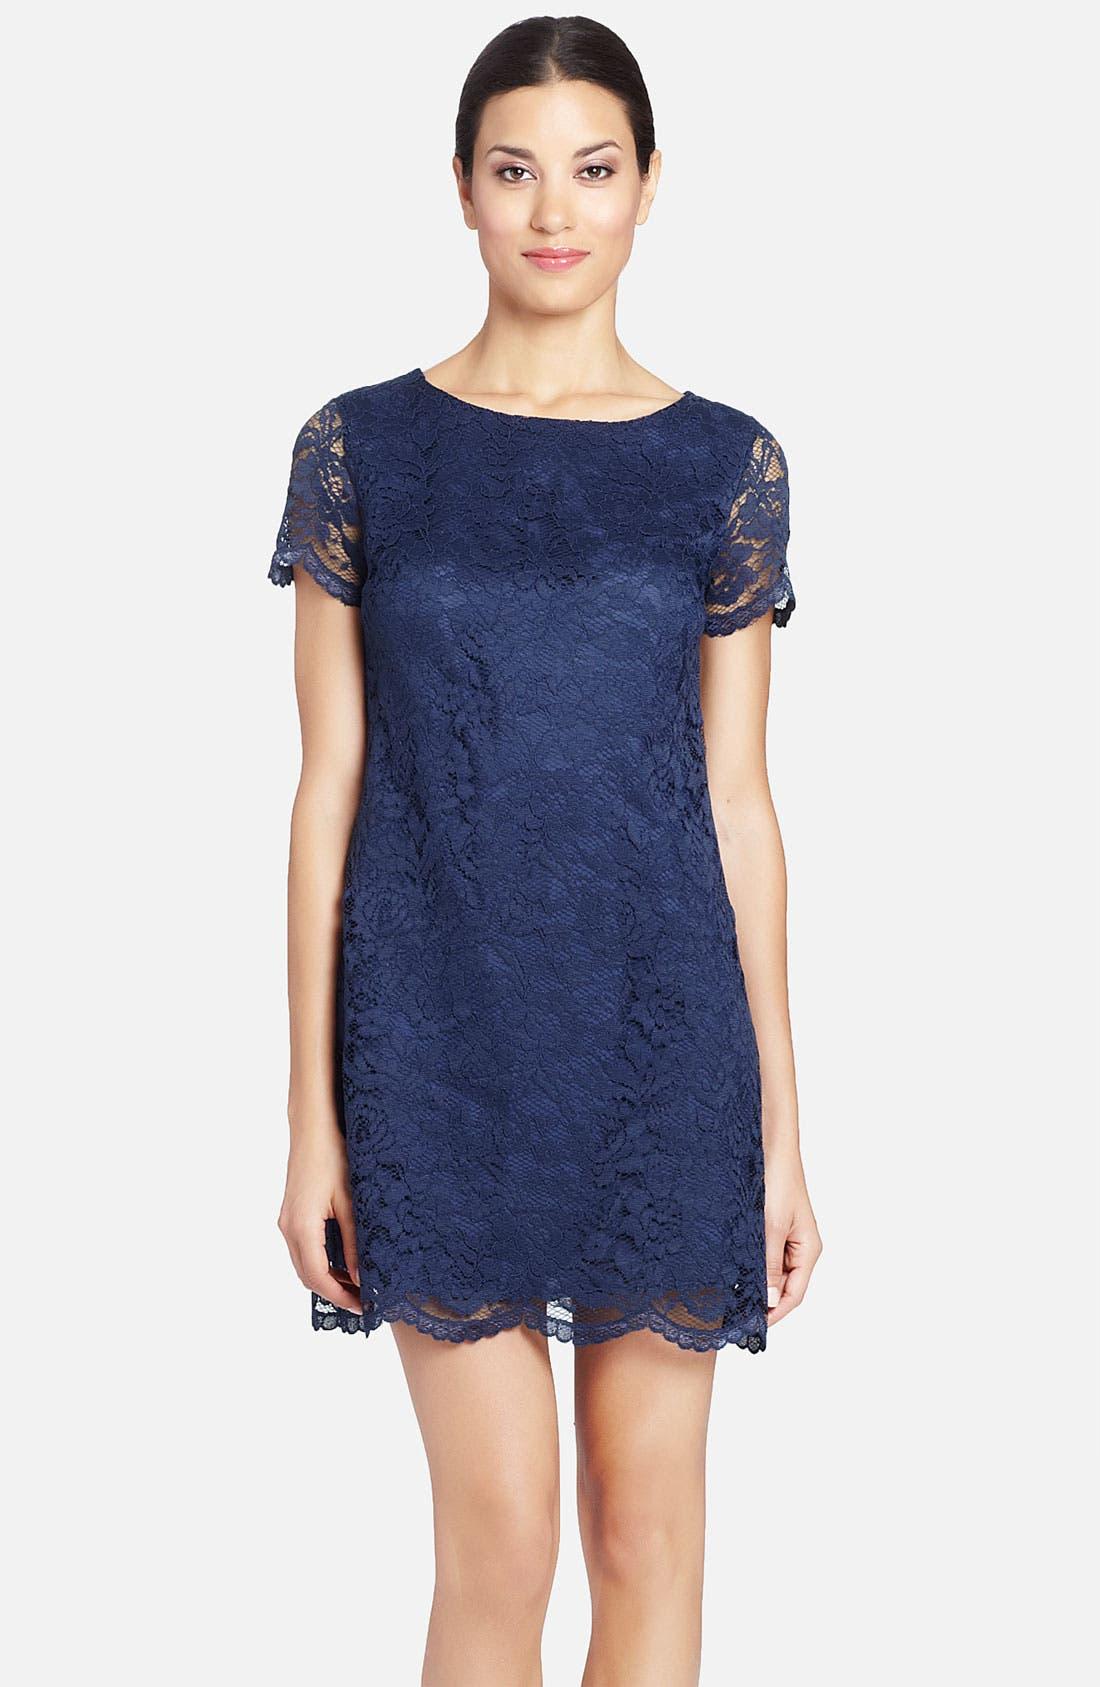 Main Image - Cynthia Steffe 'Reese' Illusion Sleeve Lace Shift Dress